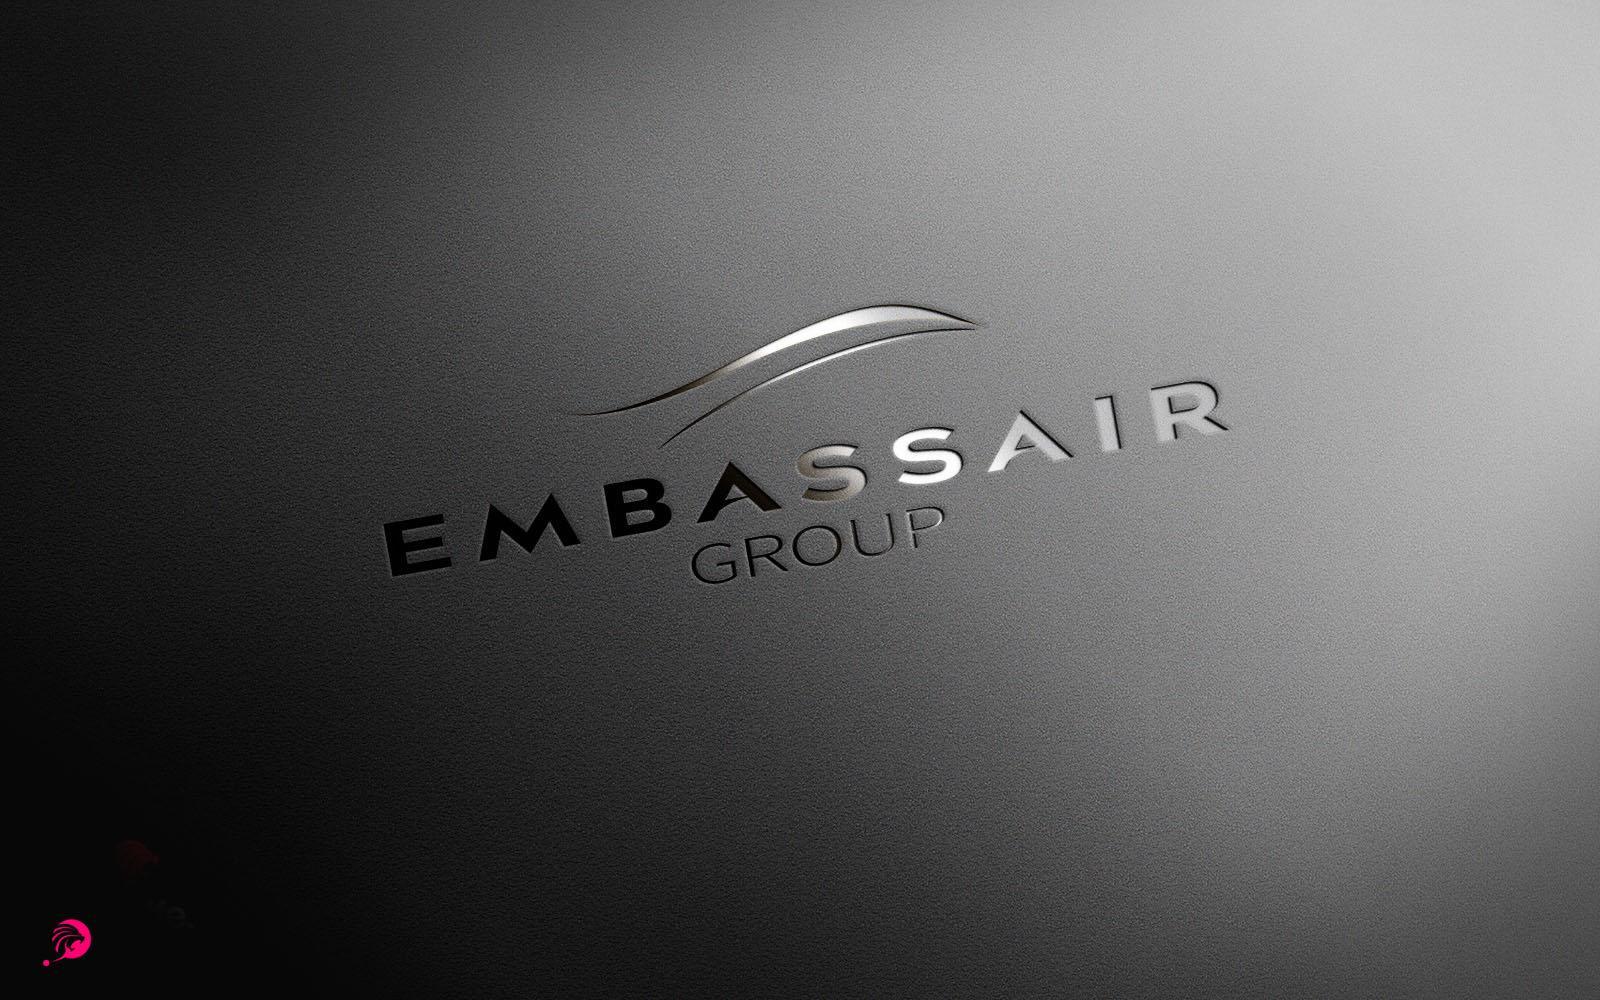 embassair-grou-logo-projet-miami